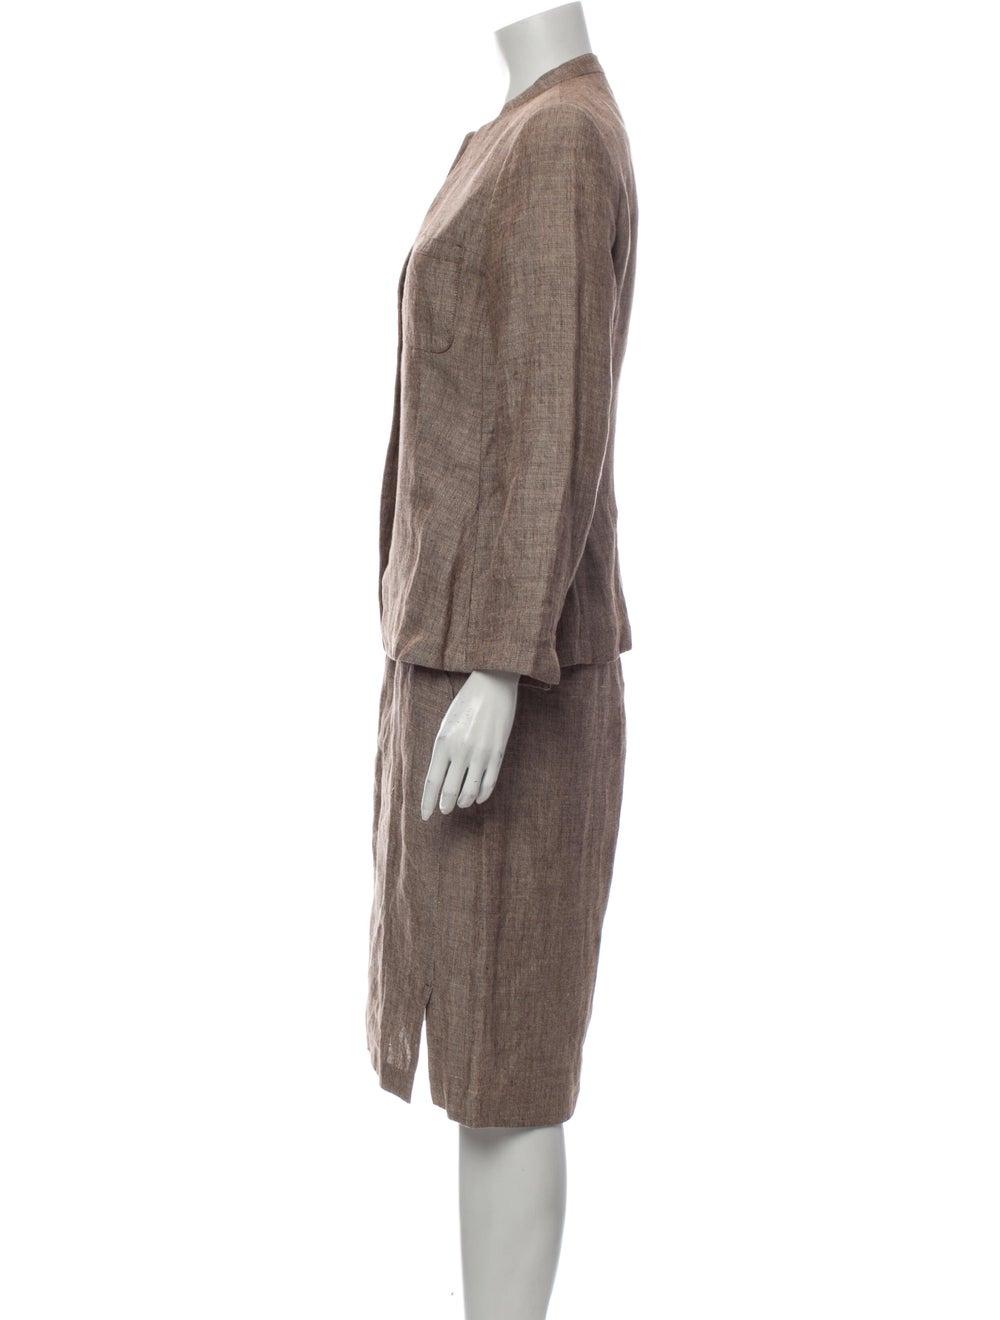 Burberry London Linen Skirt Suit - image 2